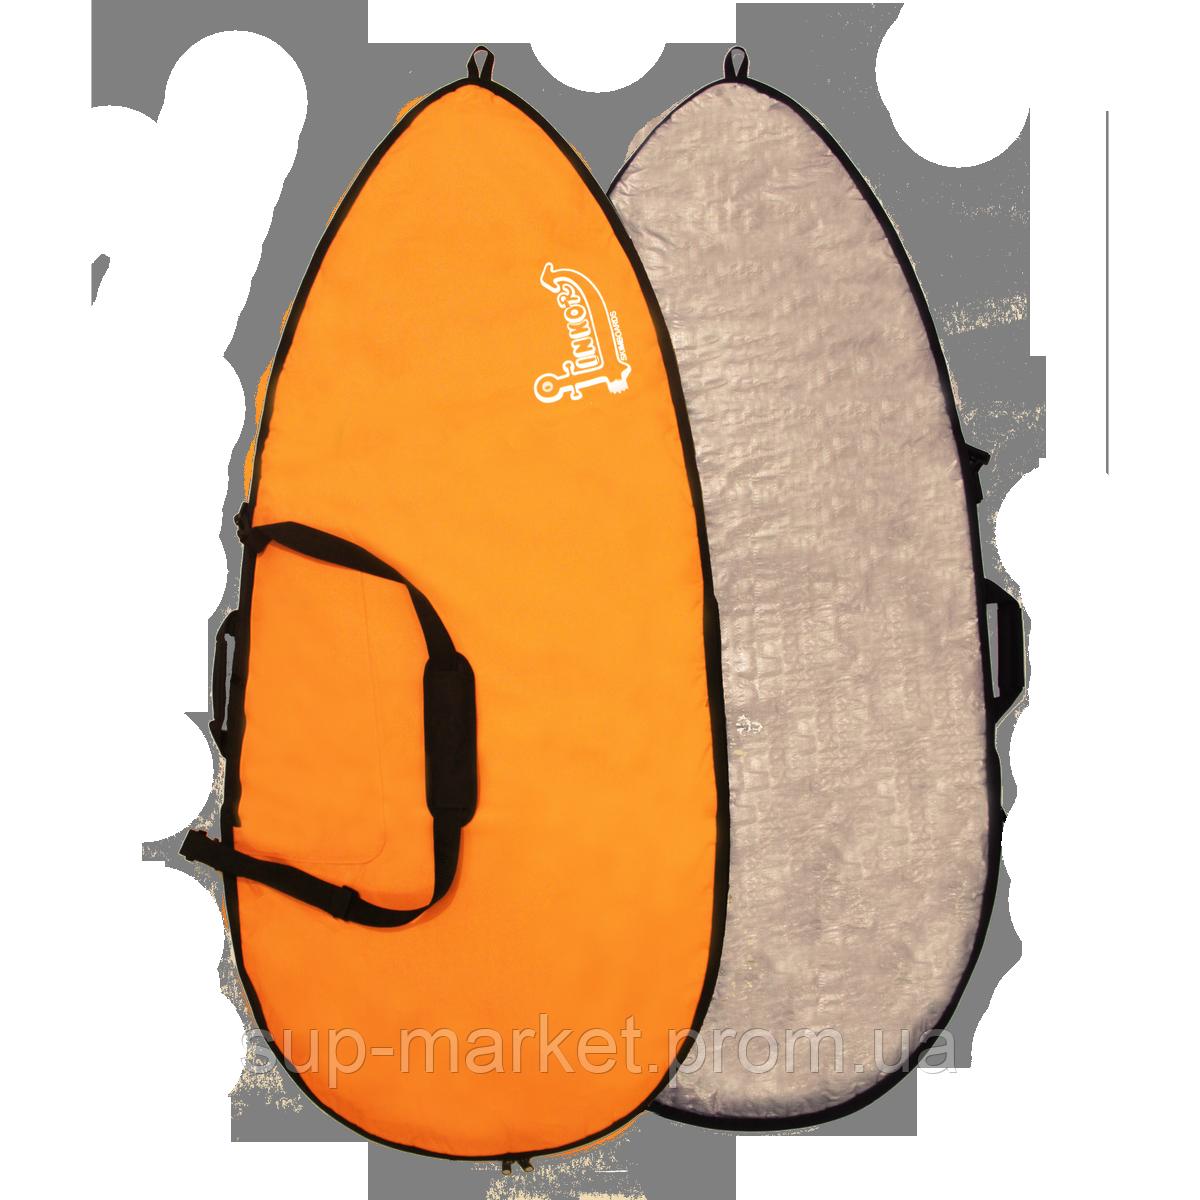 Чехол для вейксёрфа Linkorskimboards Wakesurf Pro Bag, 160 x 70cm, orange